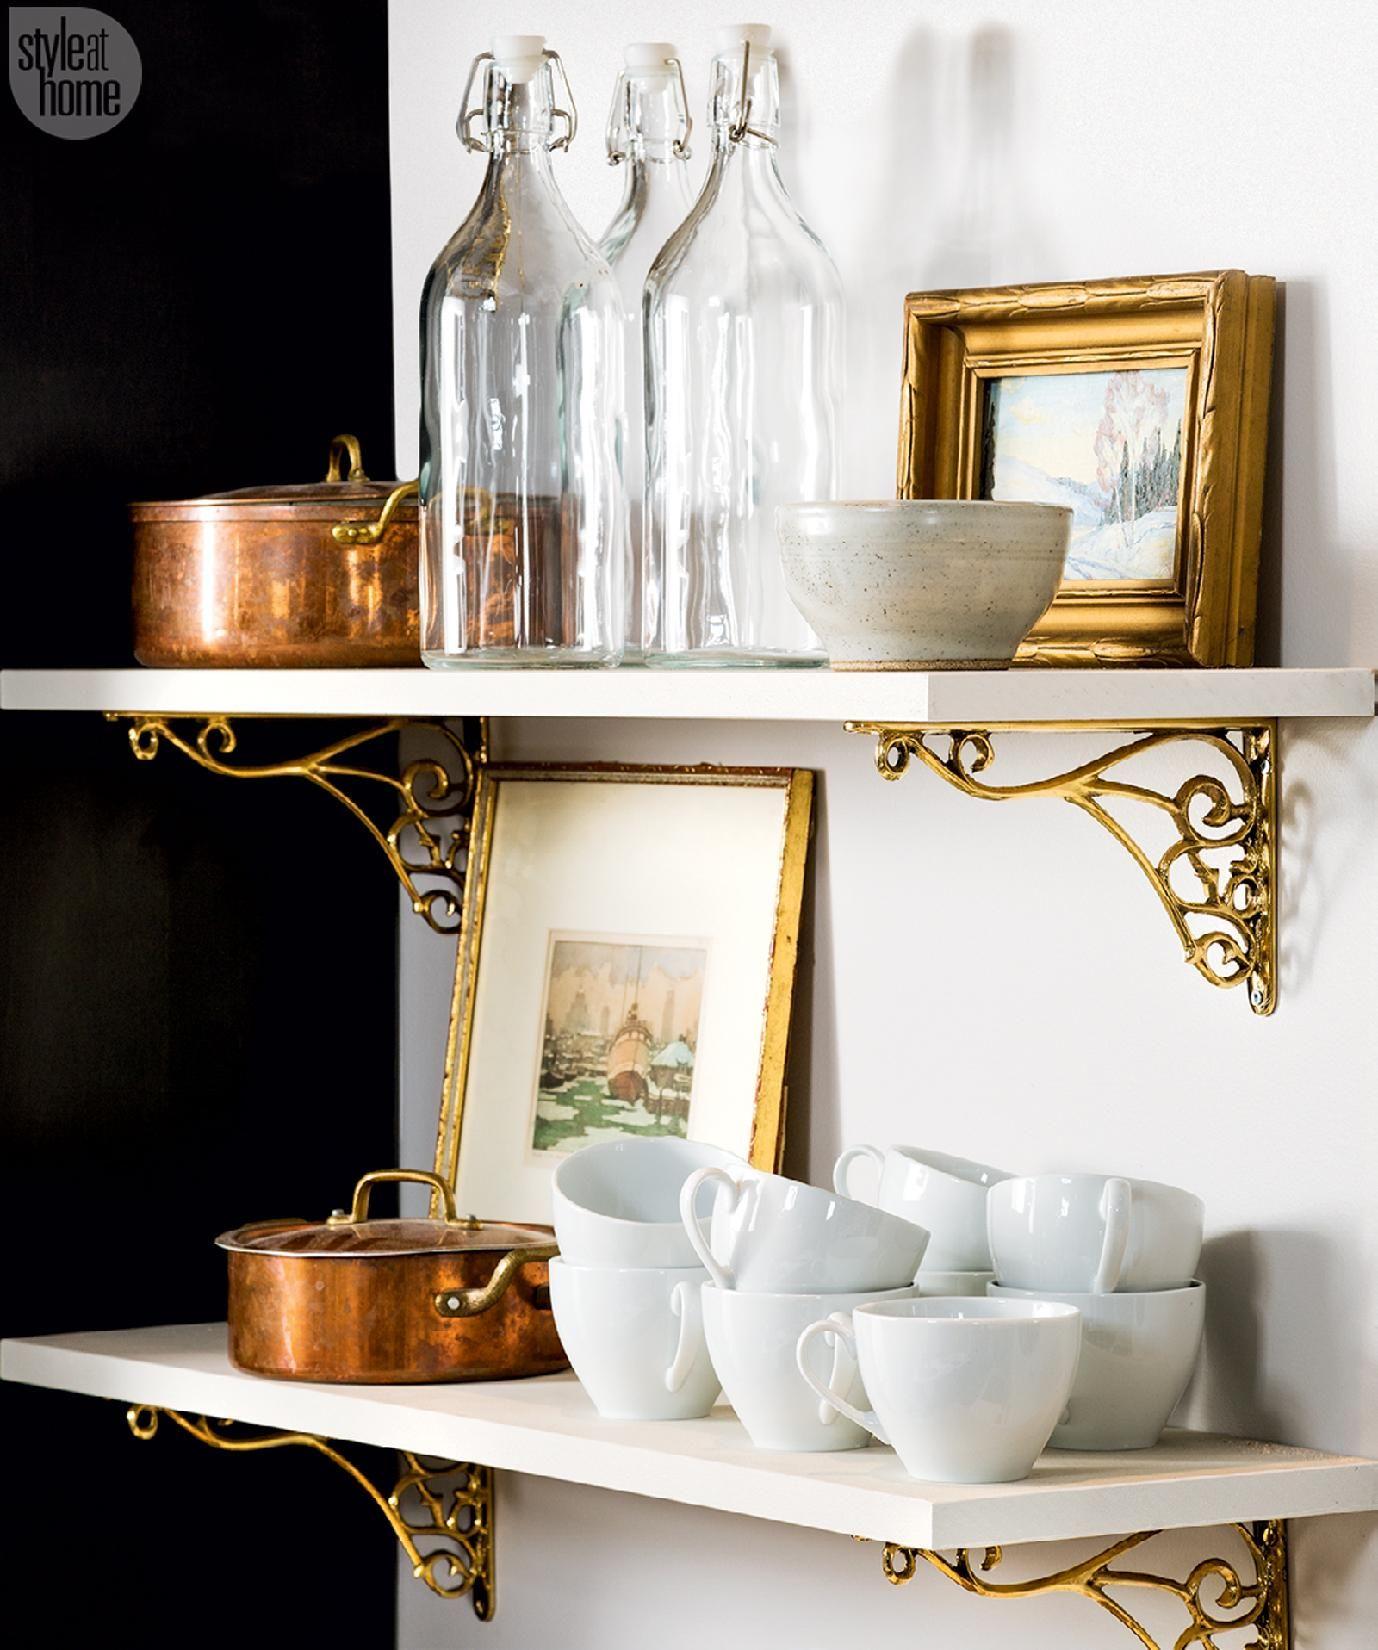 Kitchen design: Classic Parisian charm